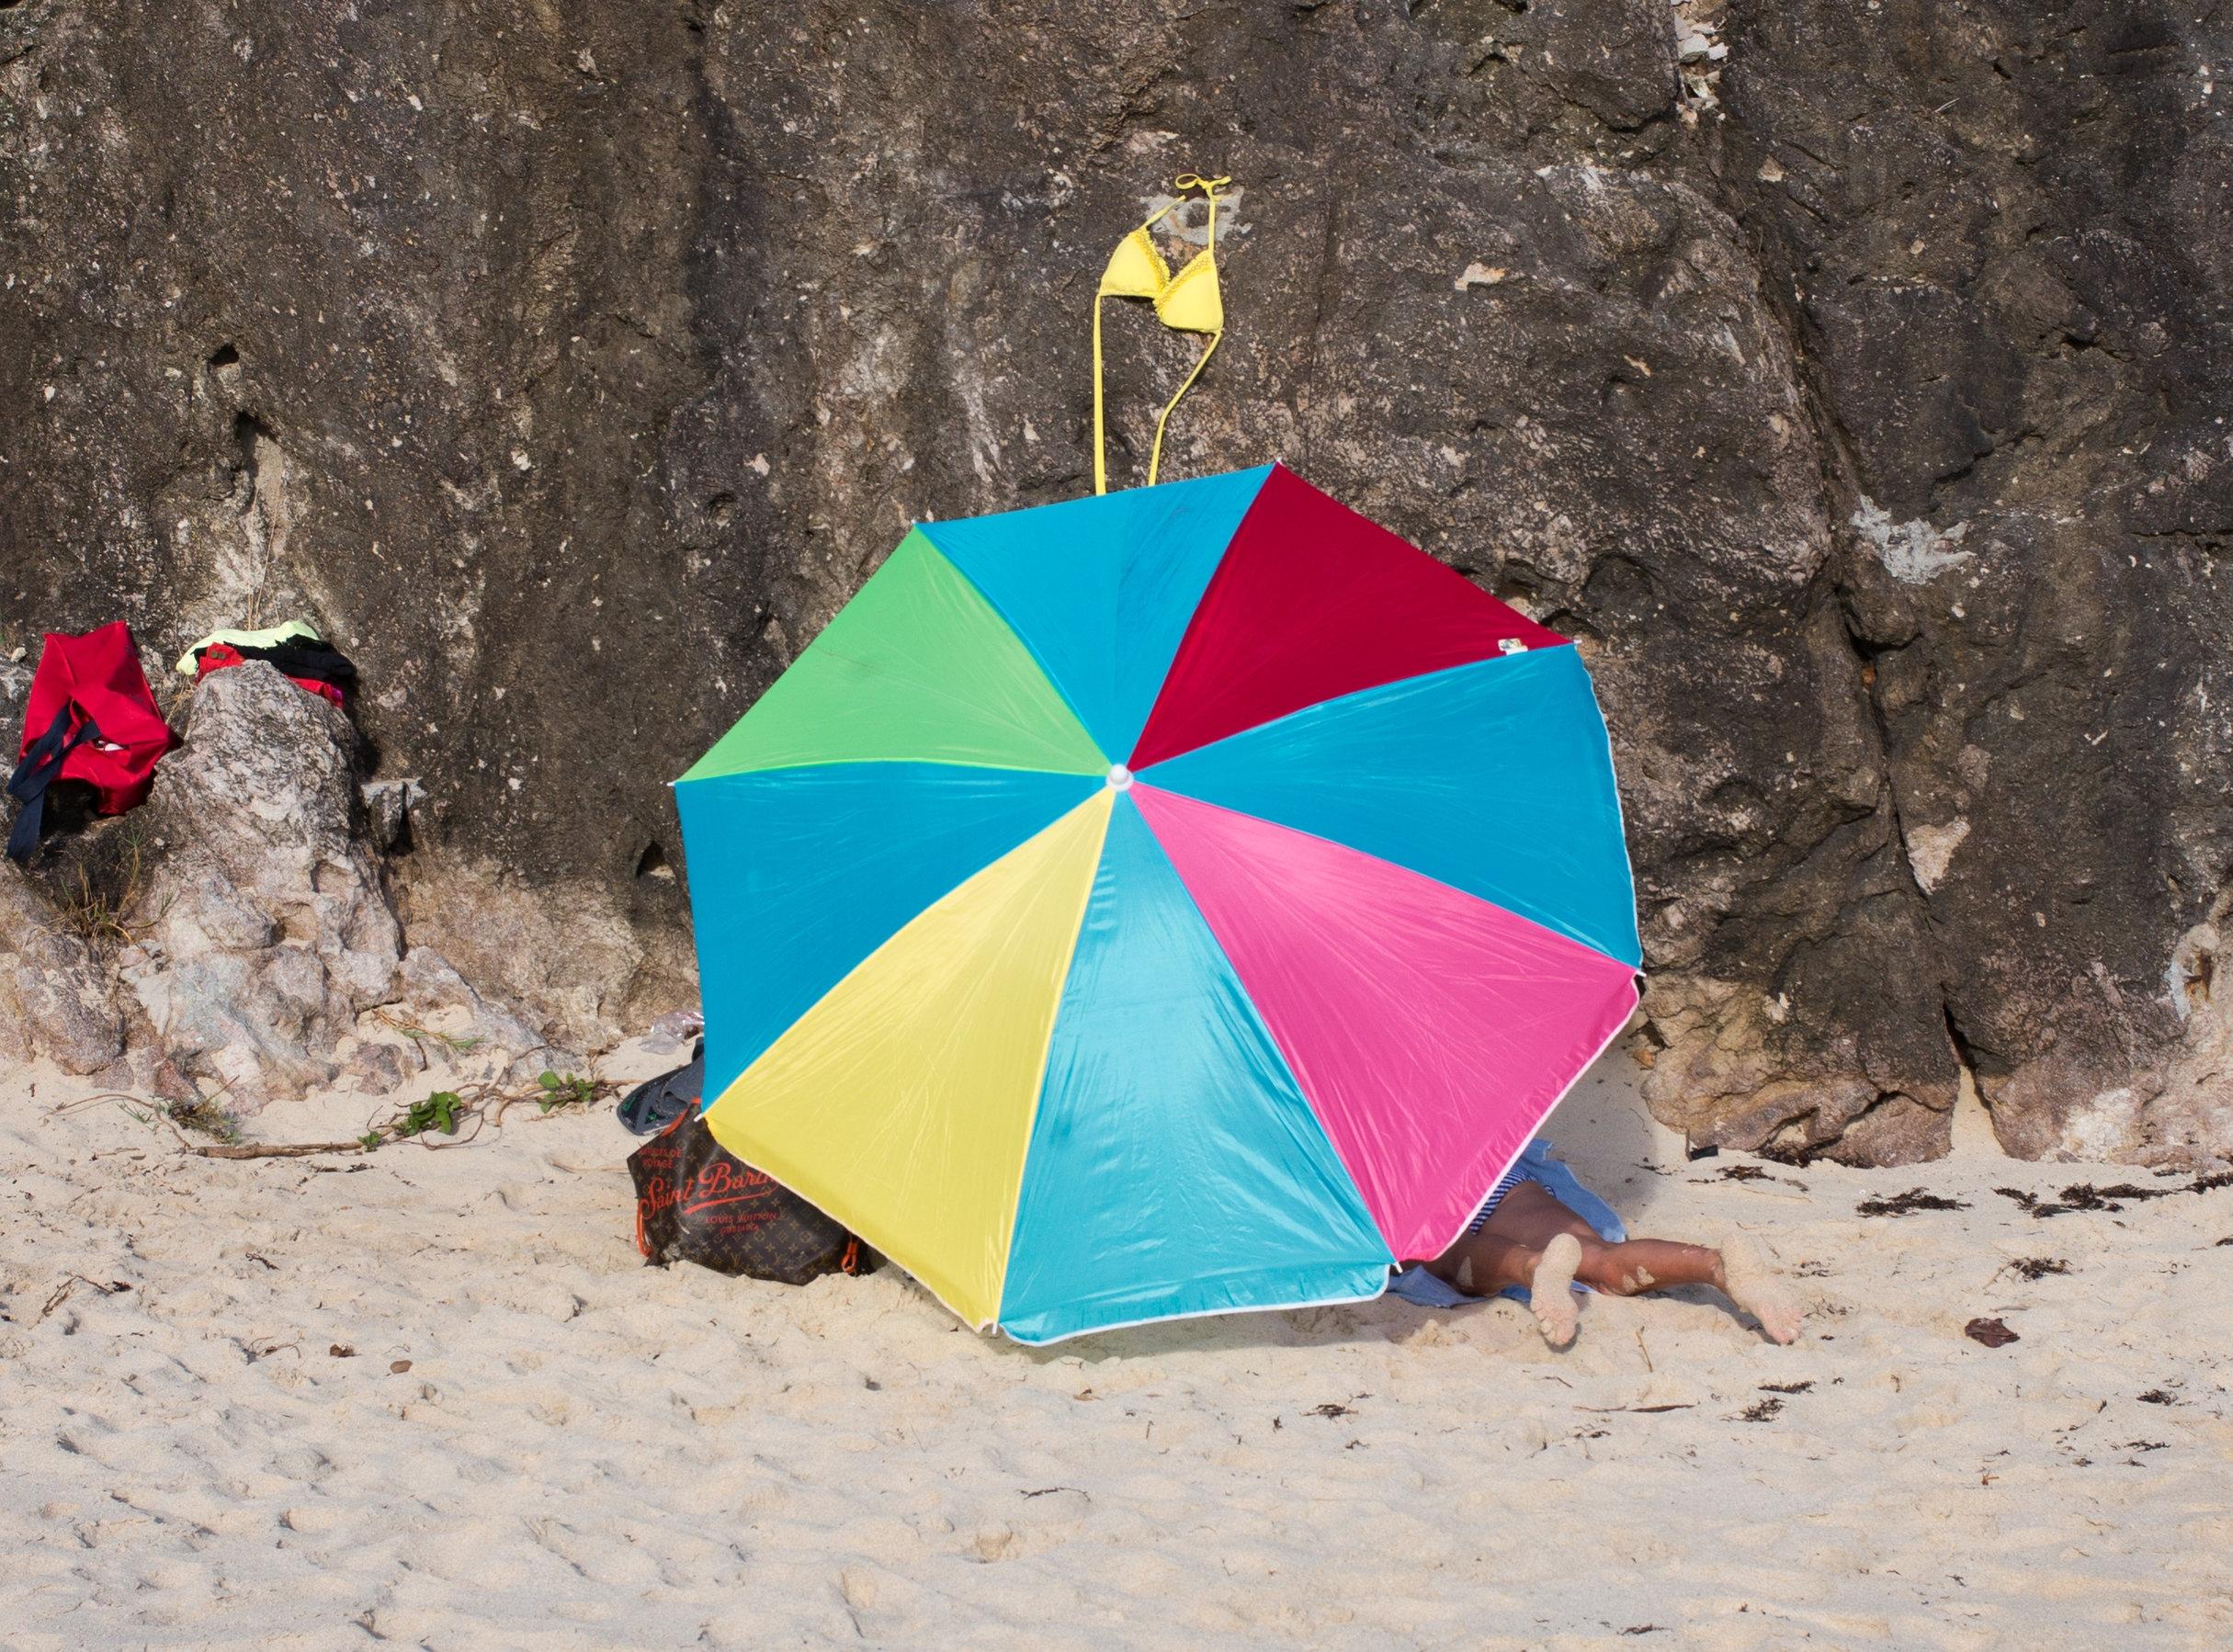 Fun at Gouverneur Beach / S'amusant à Gouverneur - Feb / fév 2015